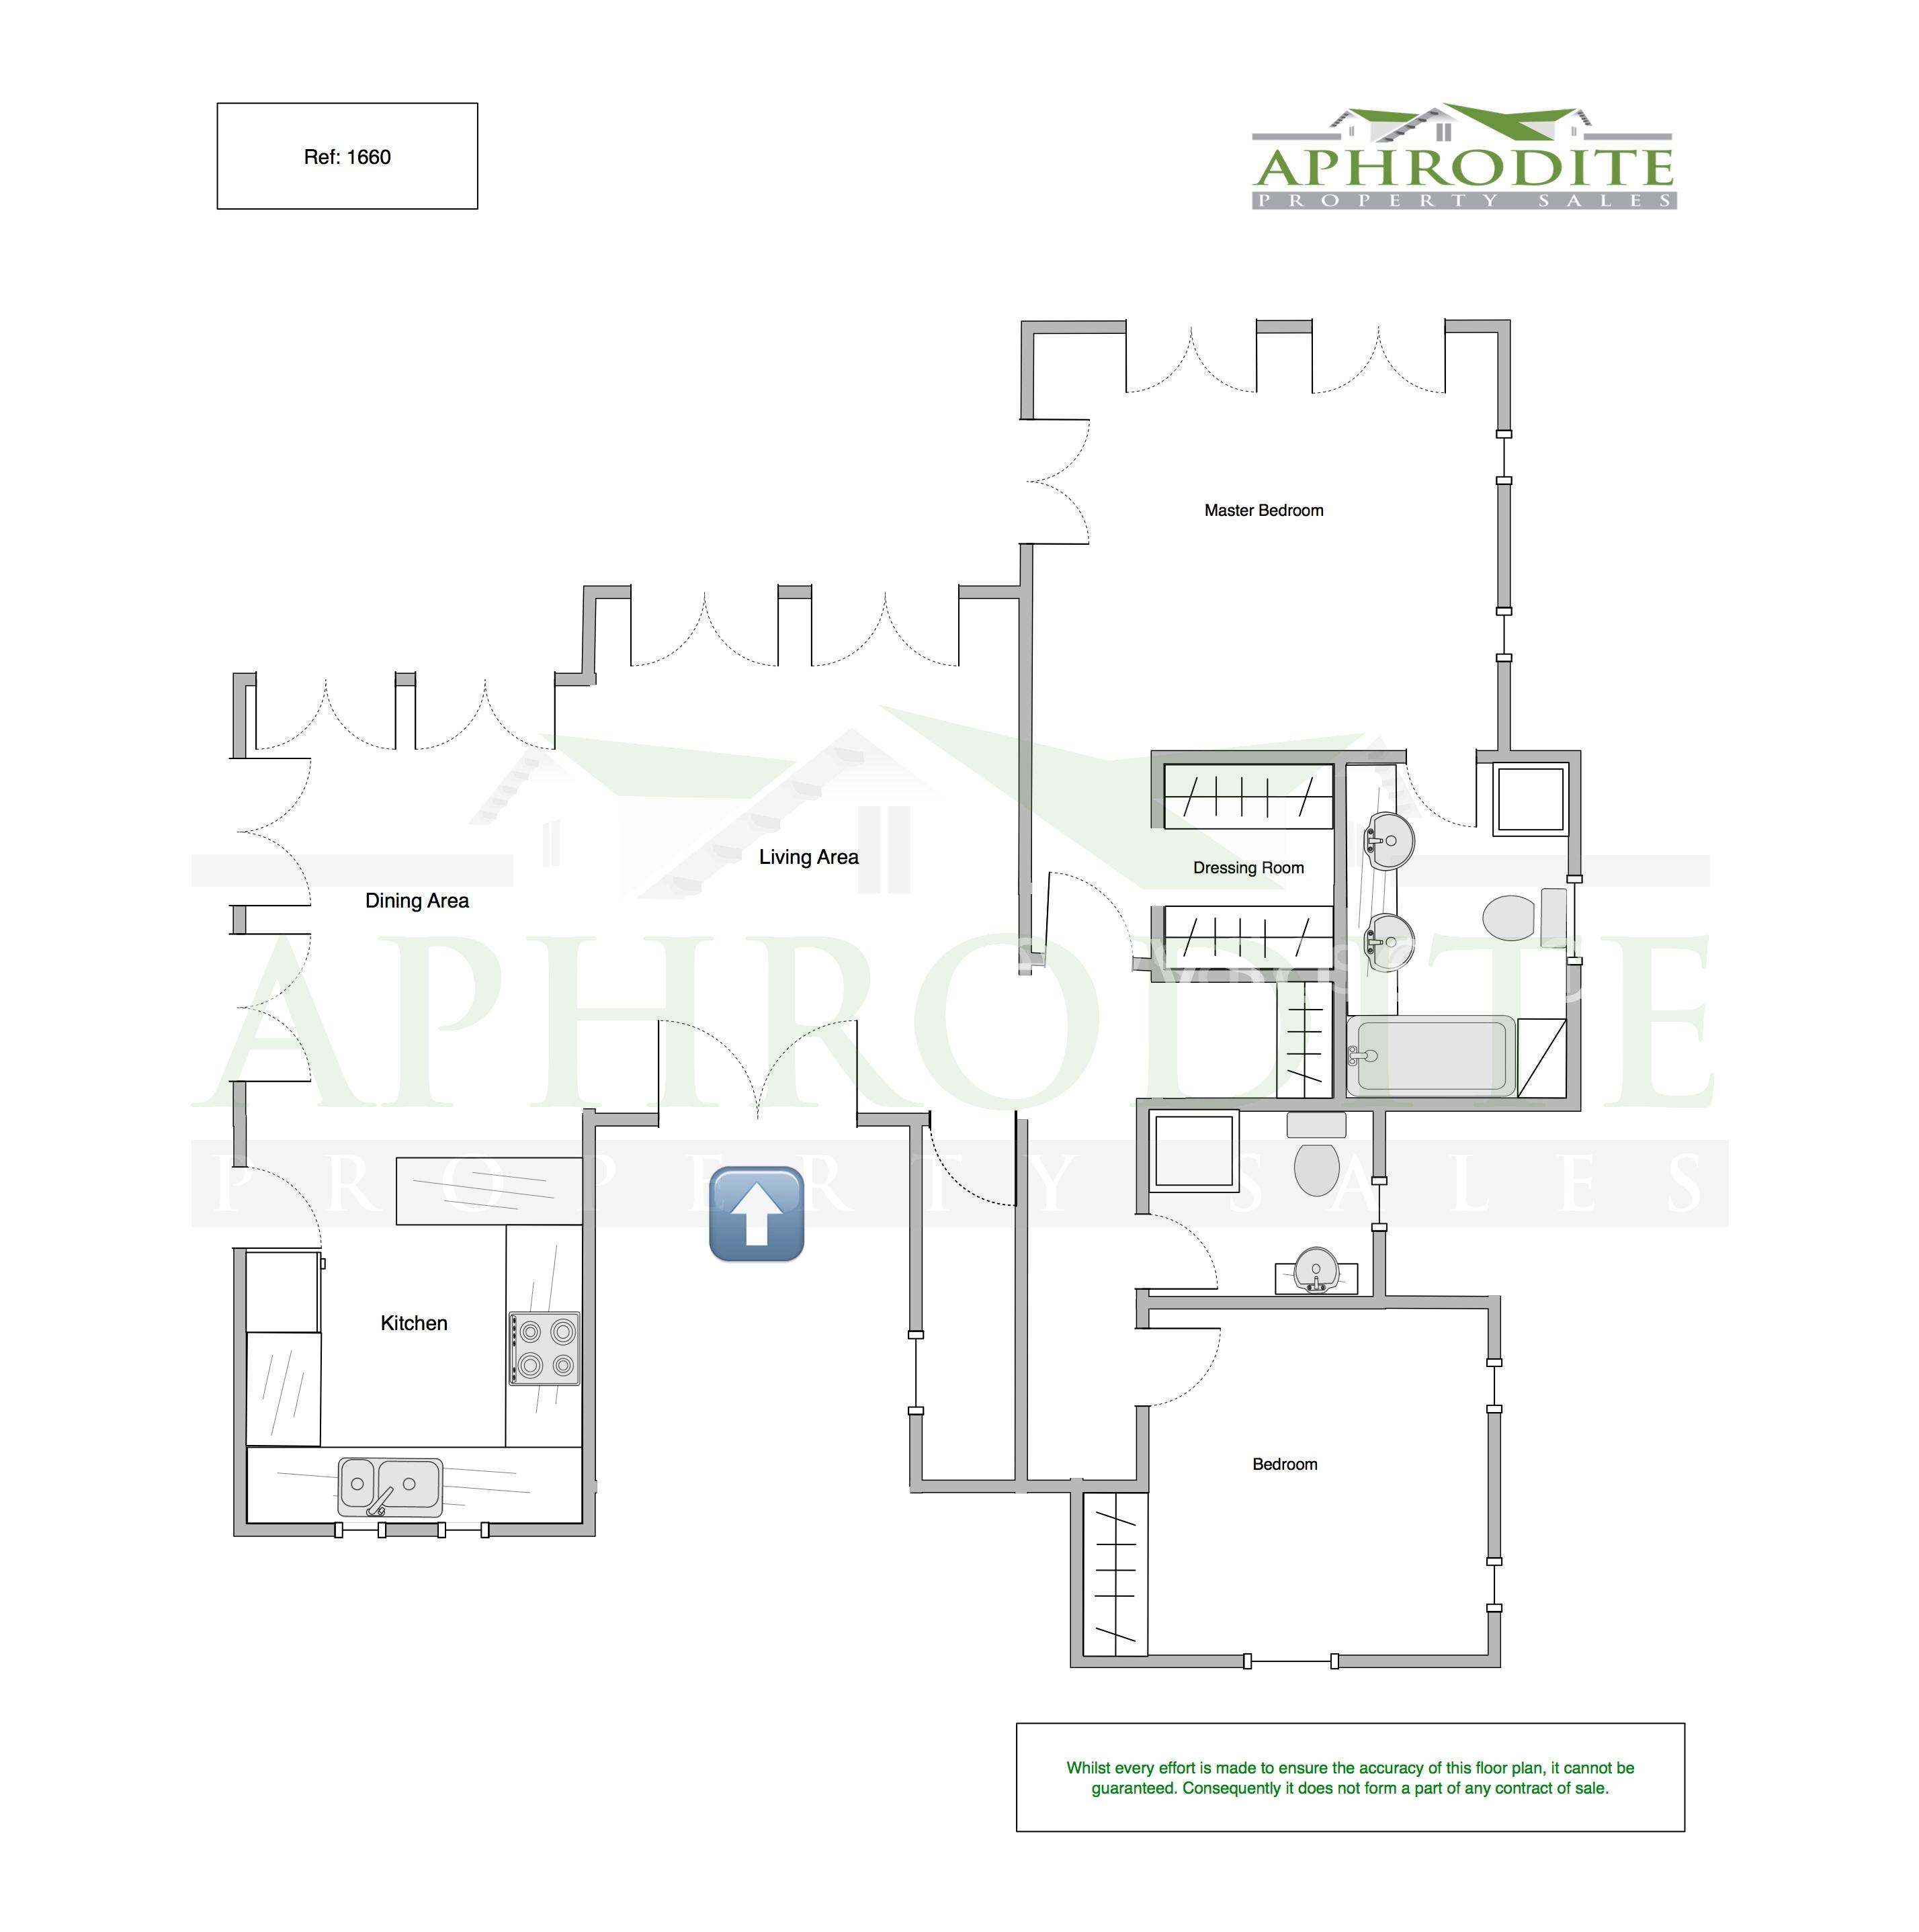 1660 - Two bedroom villa - Aphrodite Hills floorplan